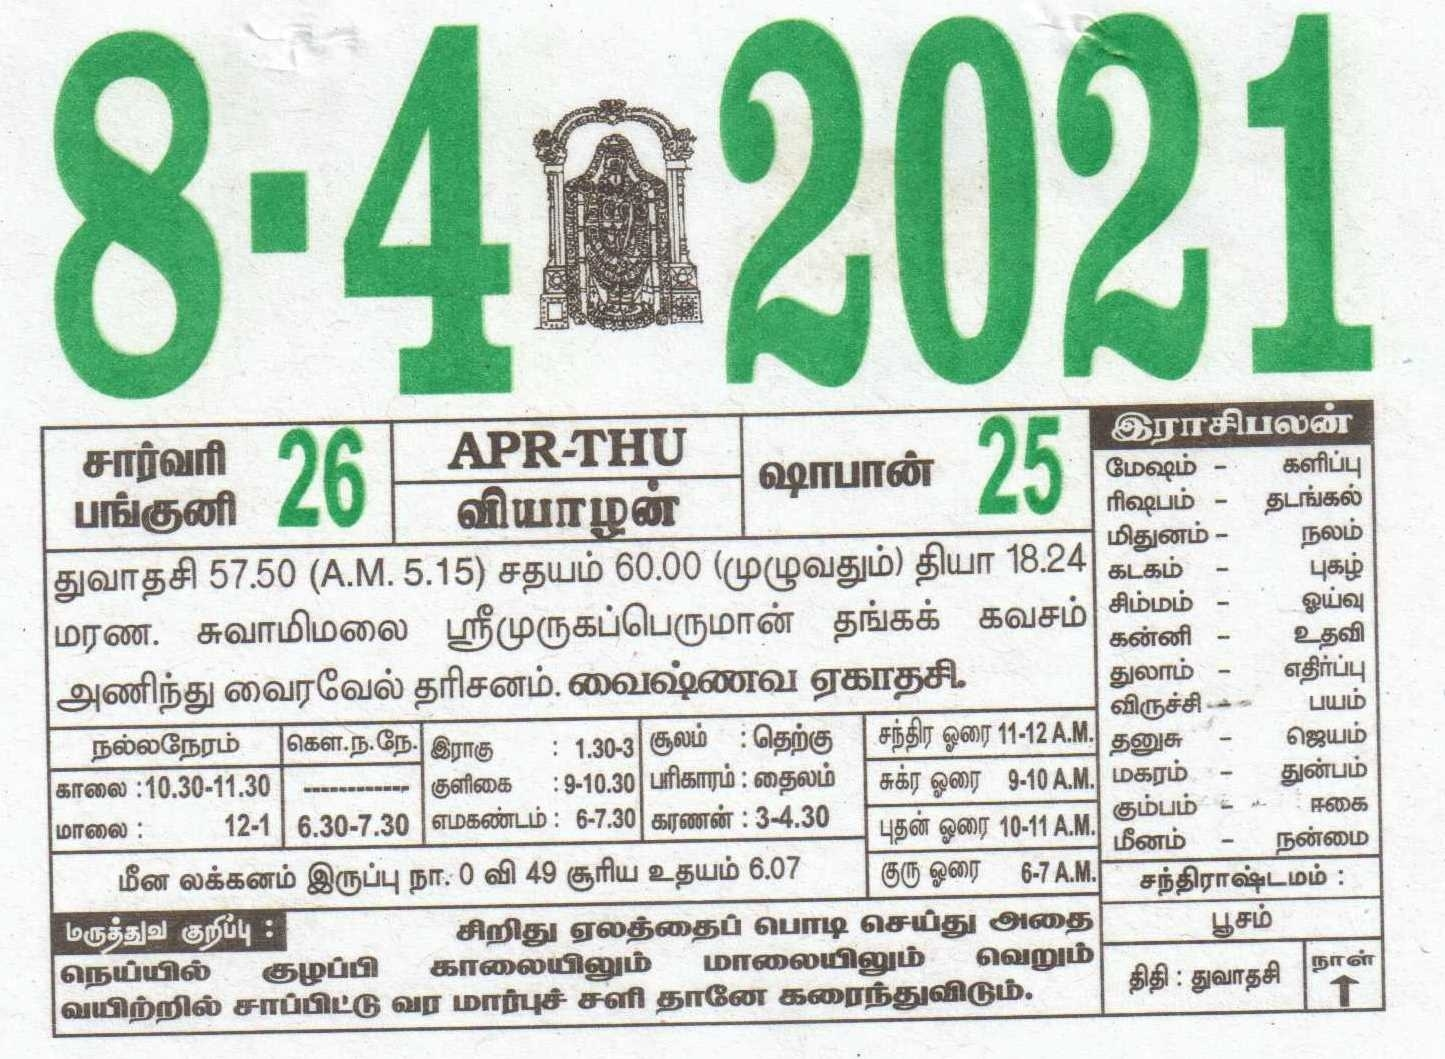 08-04-2021 Daily Calendar | Date 08 , January Daily Tear Off Calendar | Daily Panchangam Rasi Palan August 2021 Tamil Daily Calendar